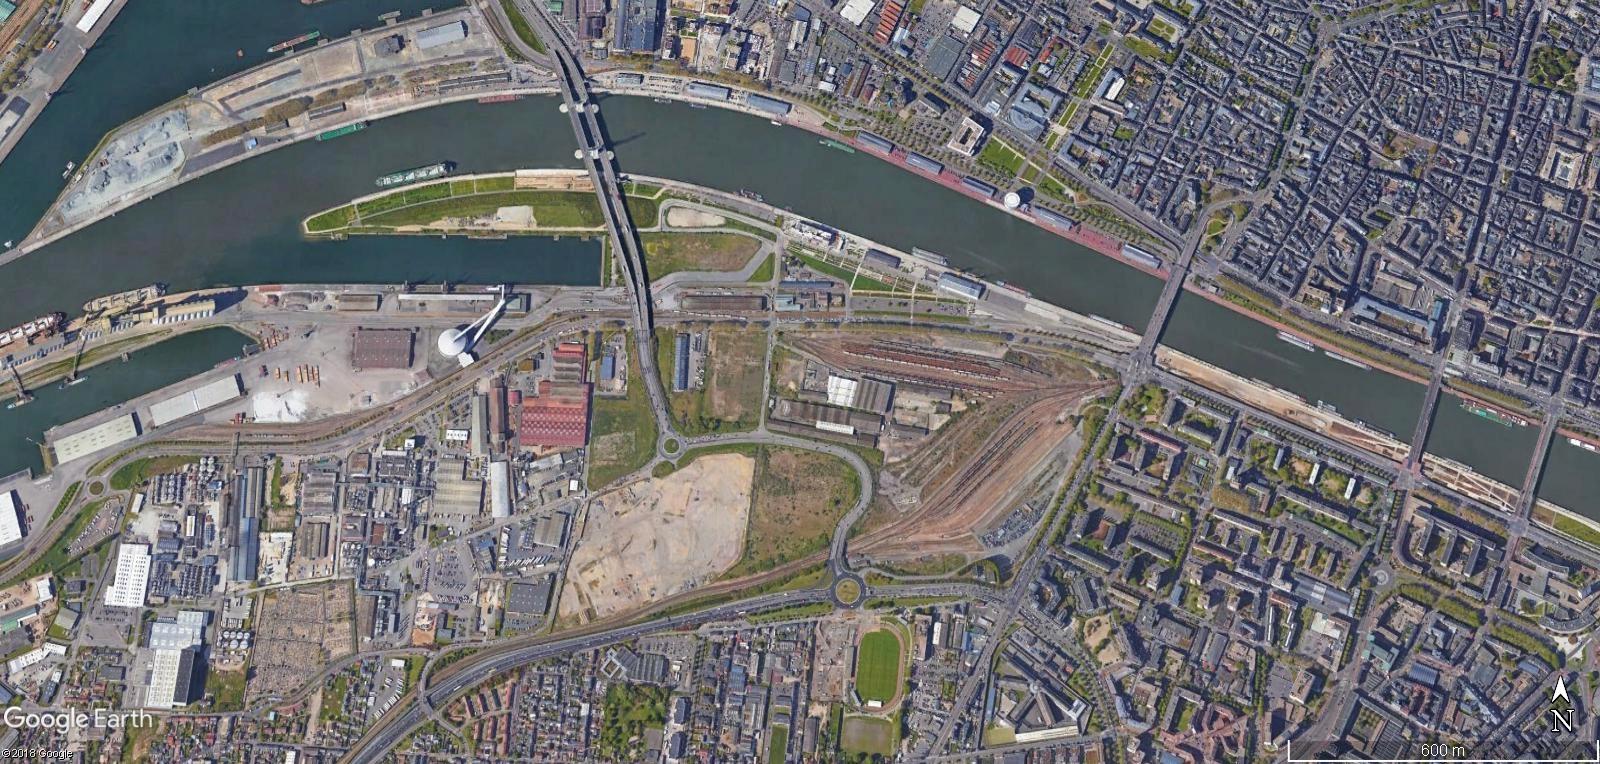 [Bientôt visible sur Google Earth] - Rouen - Ecoquartier Flaubert Today10